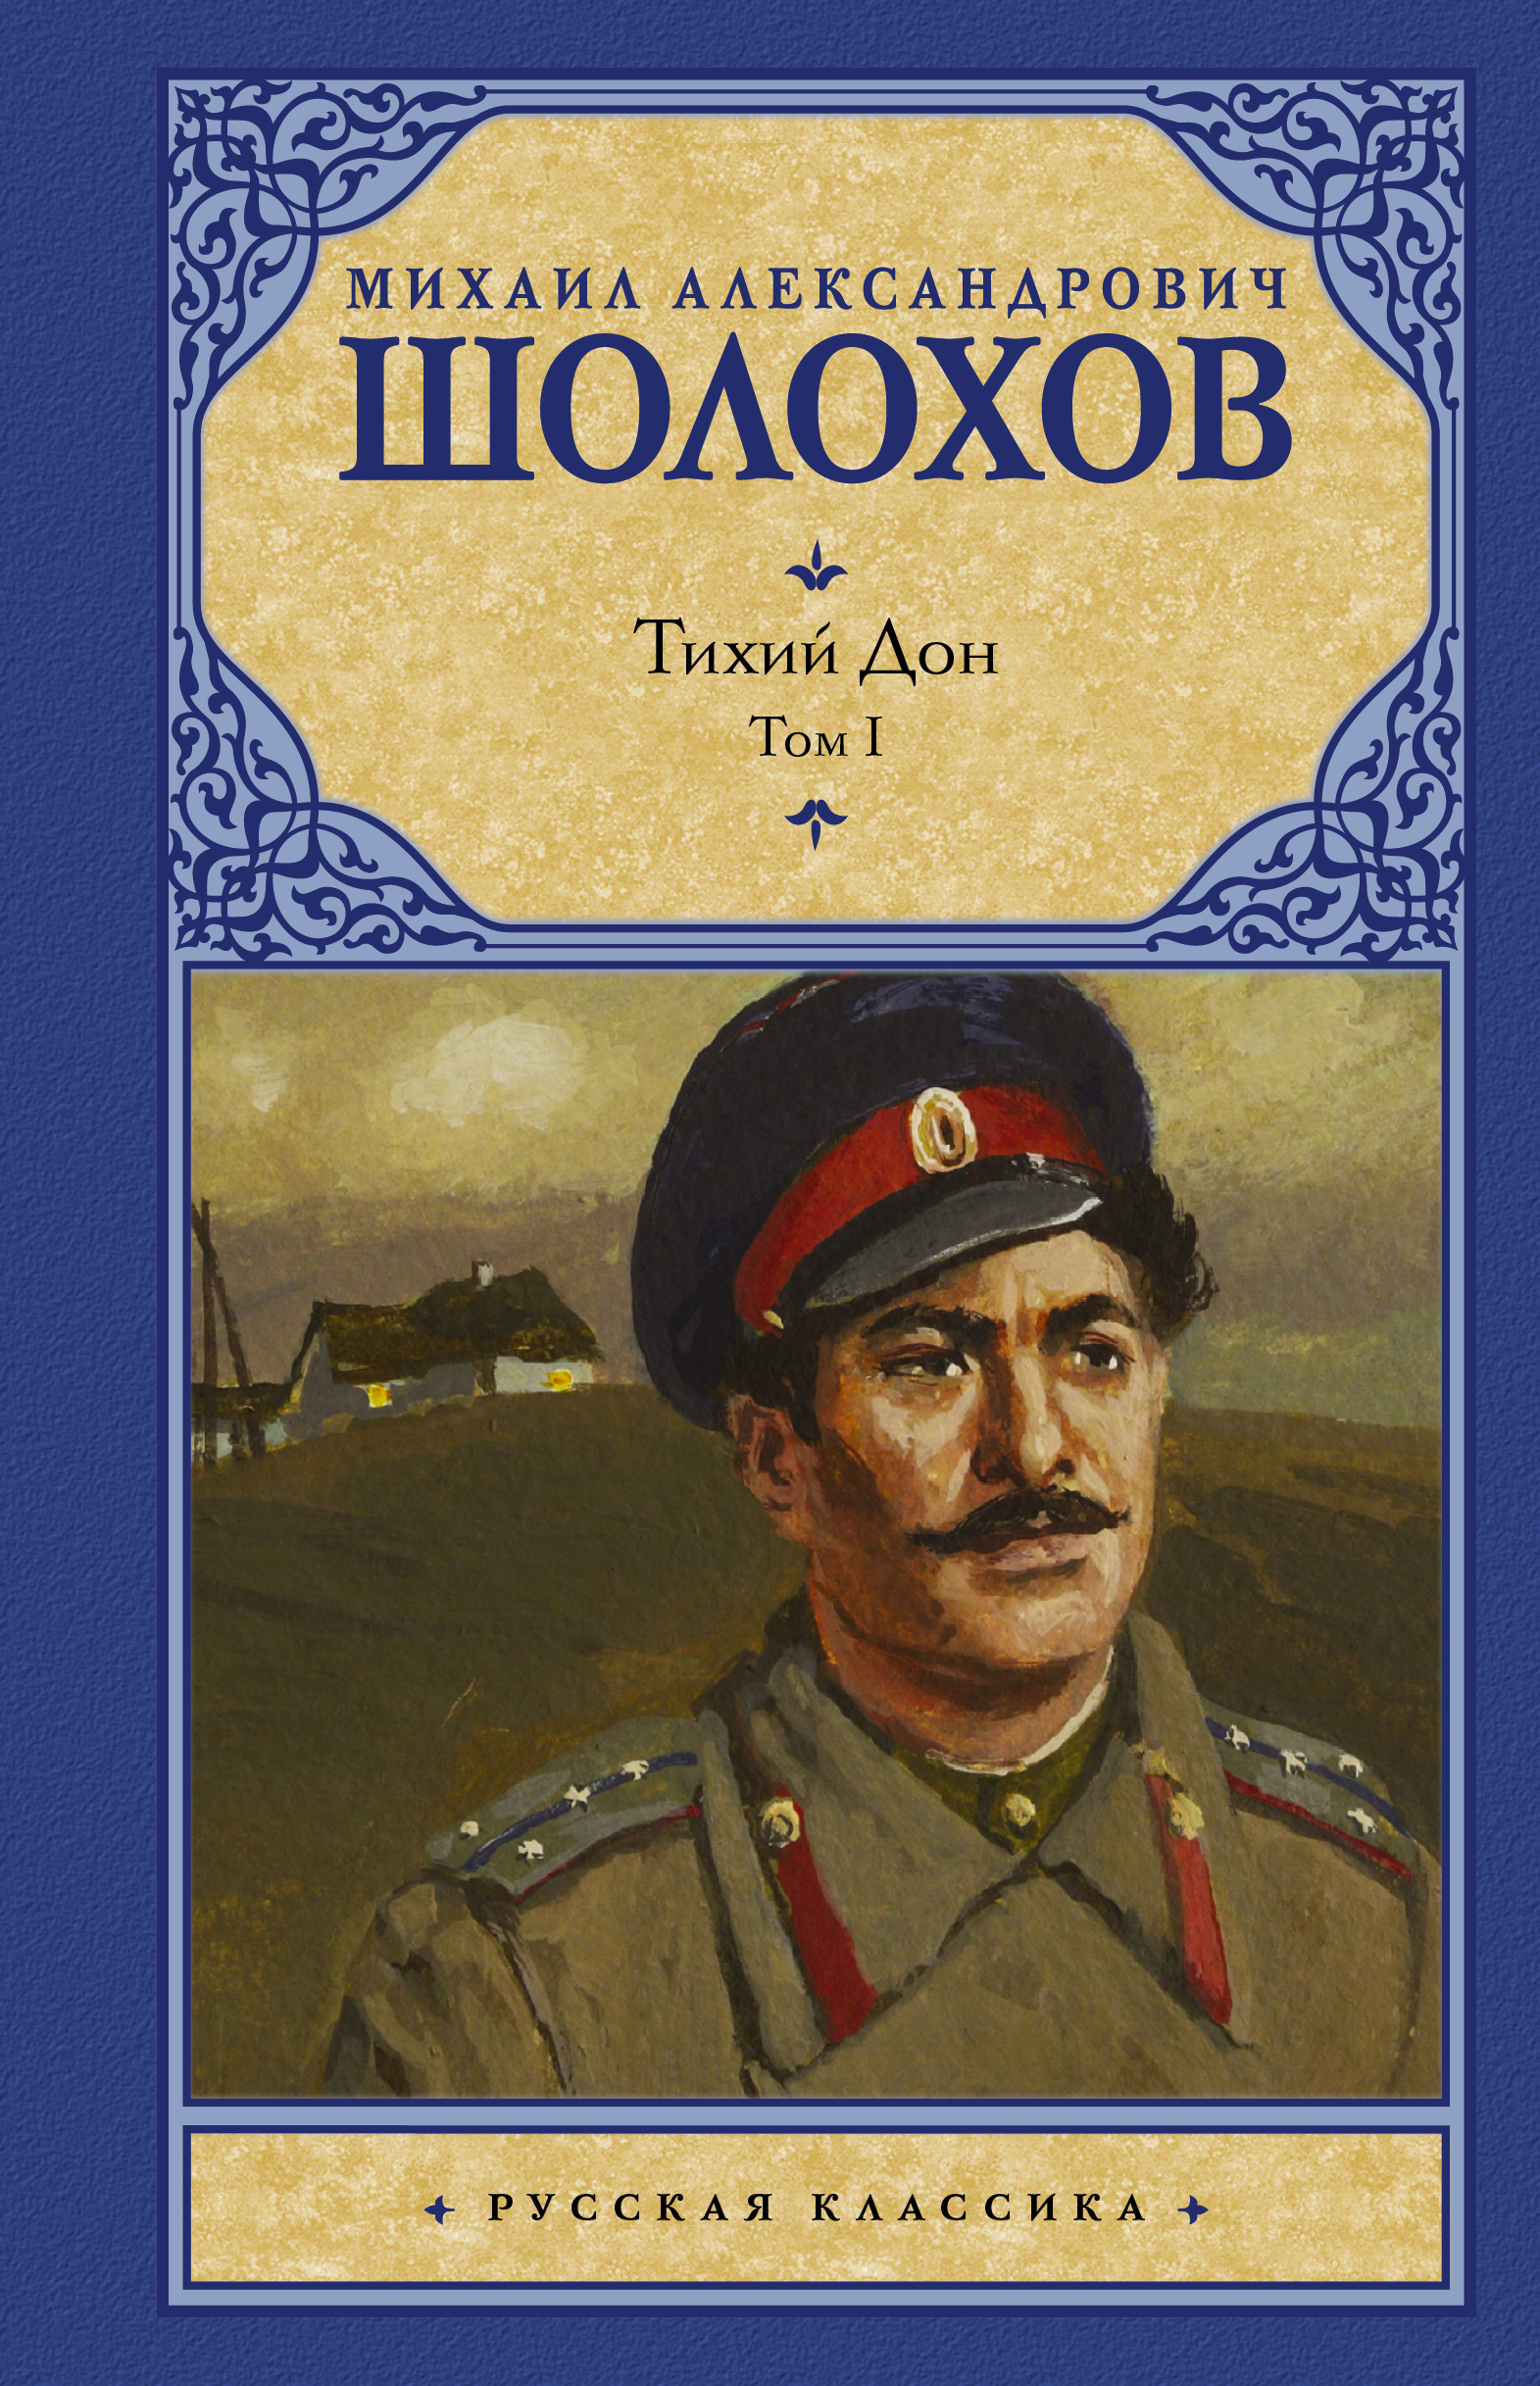 Михаил Шолохов Тихий Дон. [ В 2 т.]. Т. 1 цена